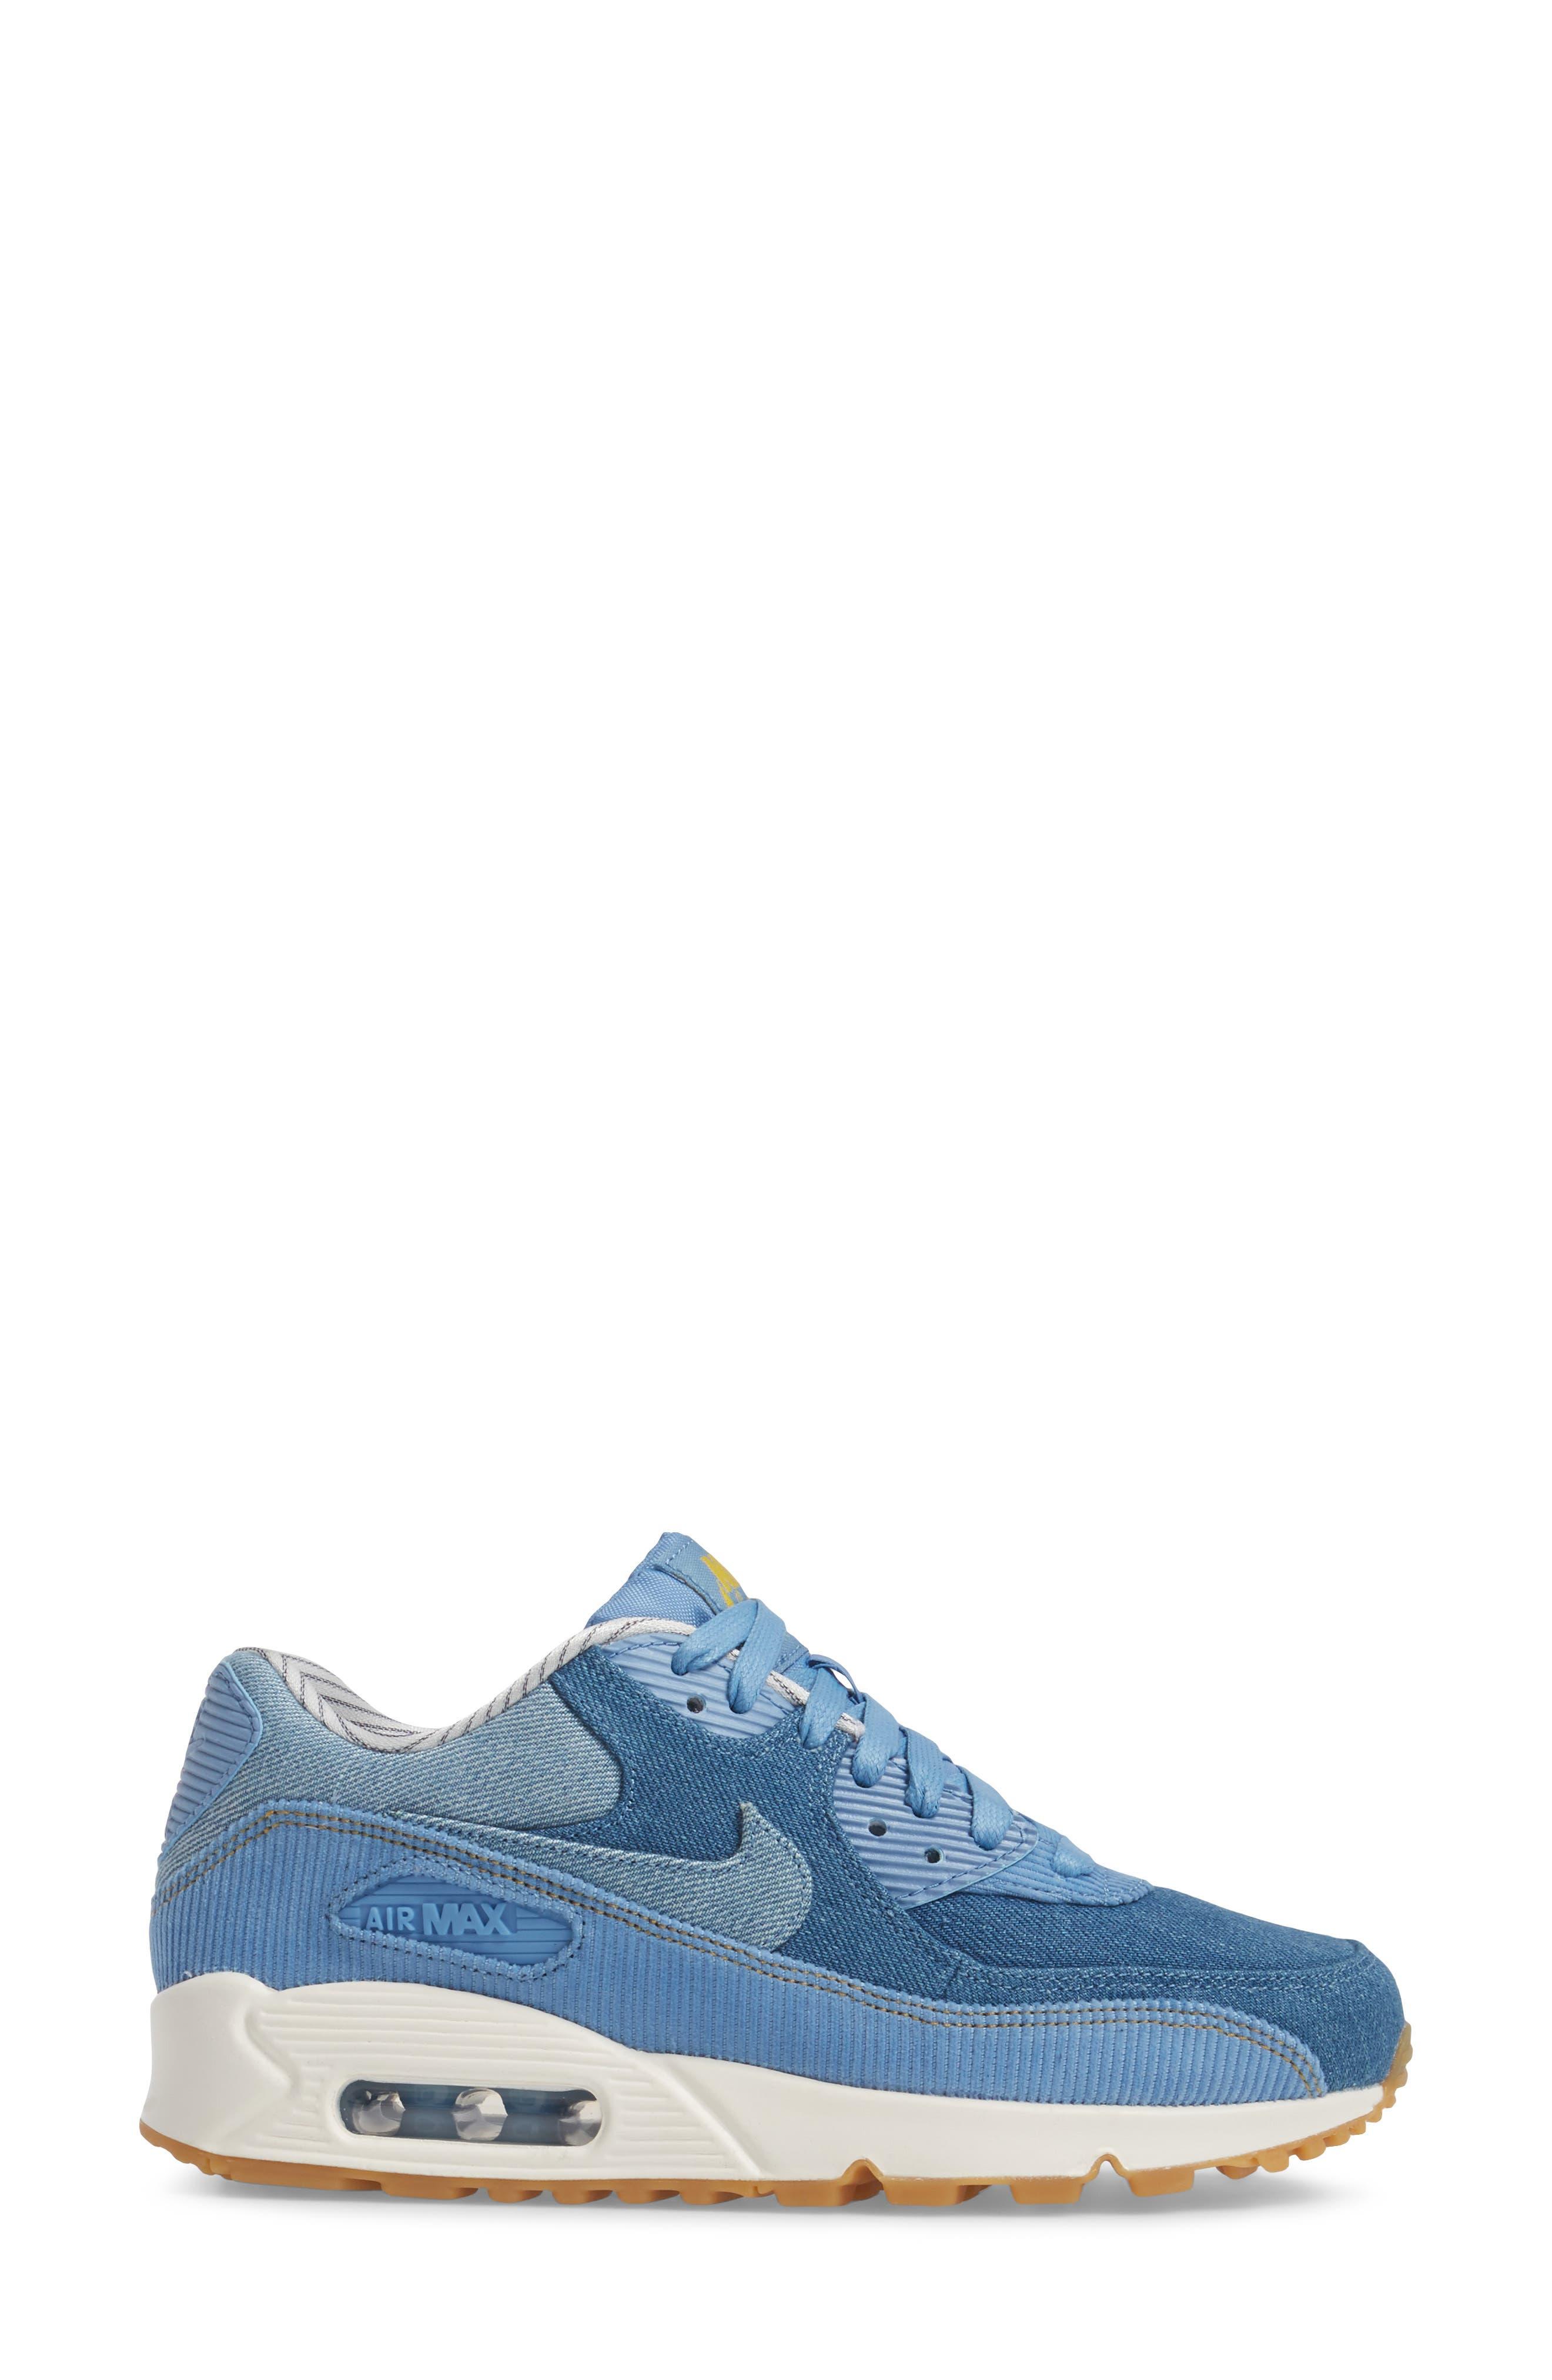 Air Max 90 SE Sneaker,                             Alternate thumbnail 26, color,